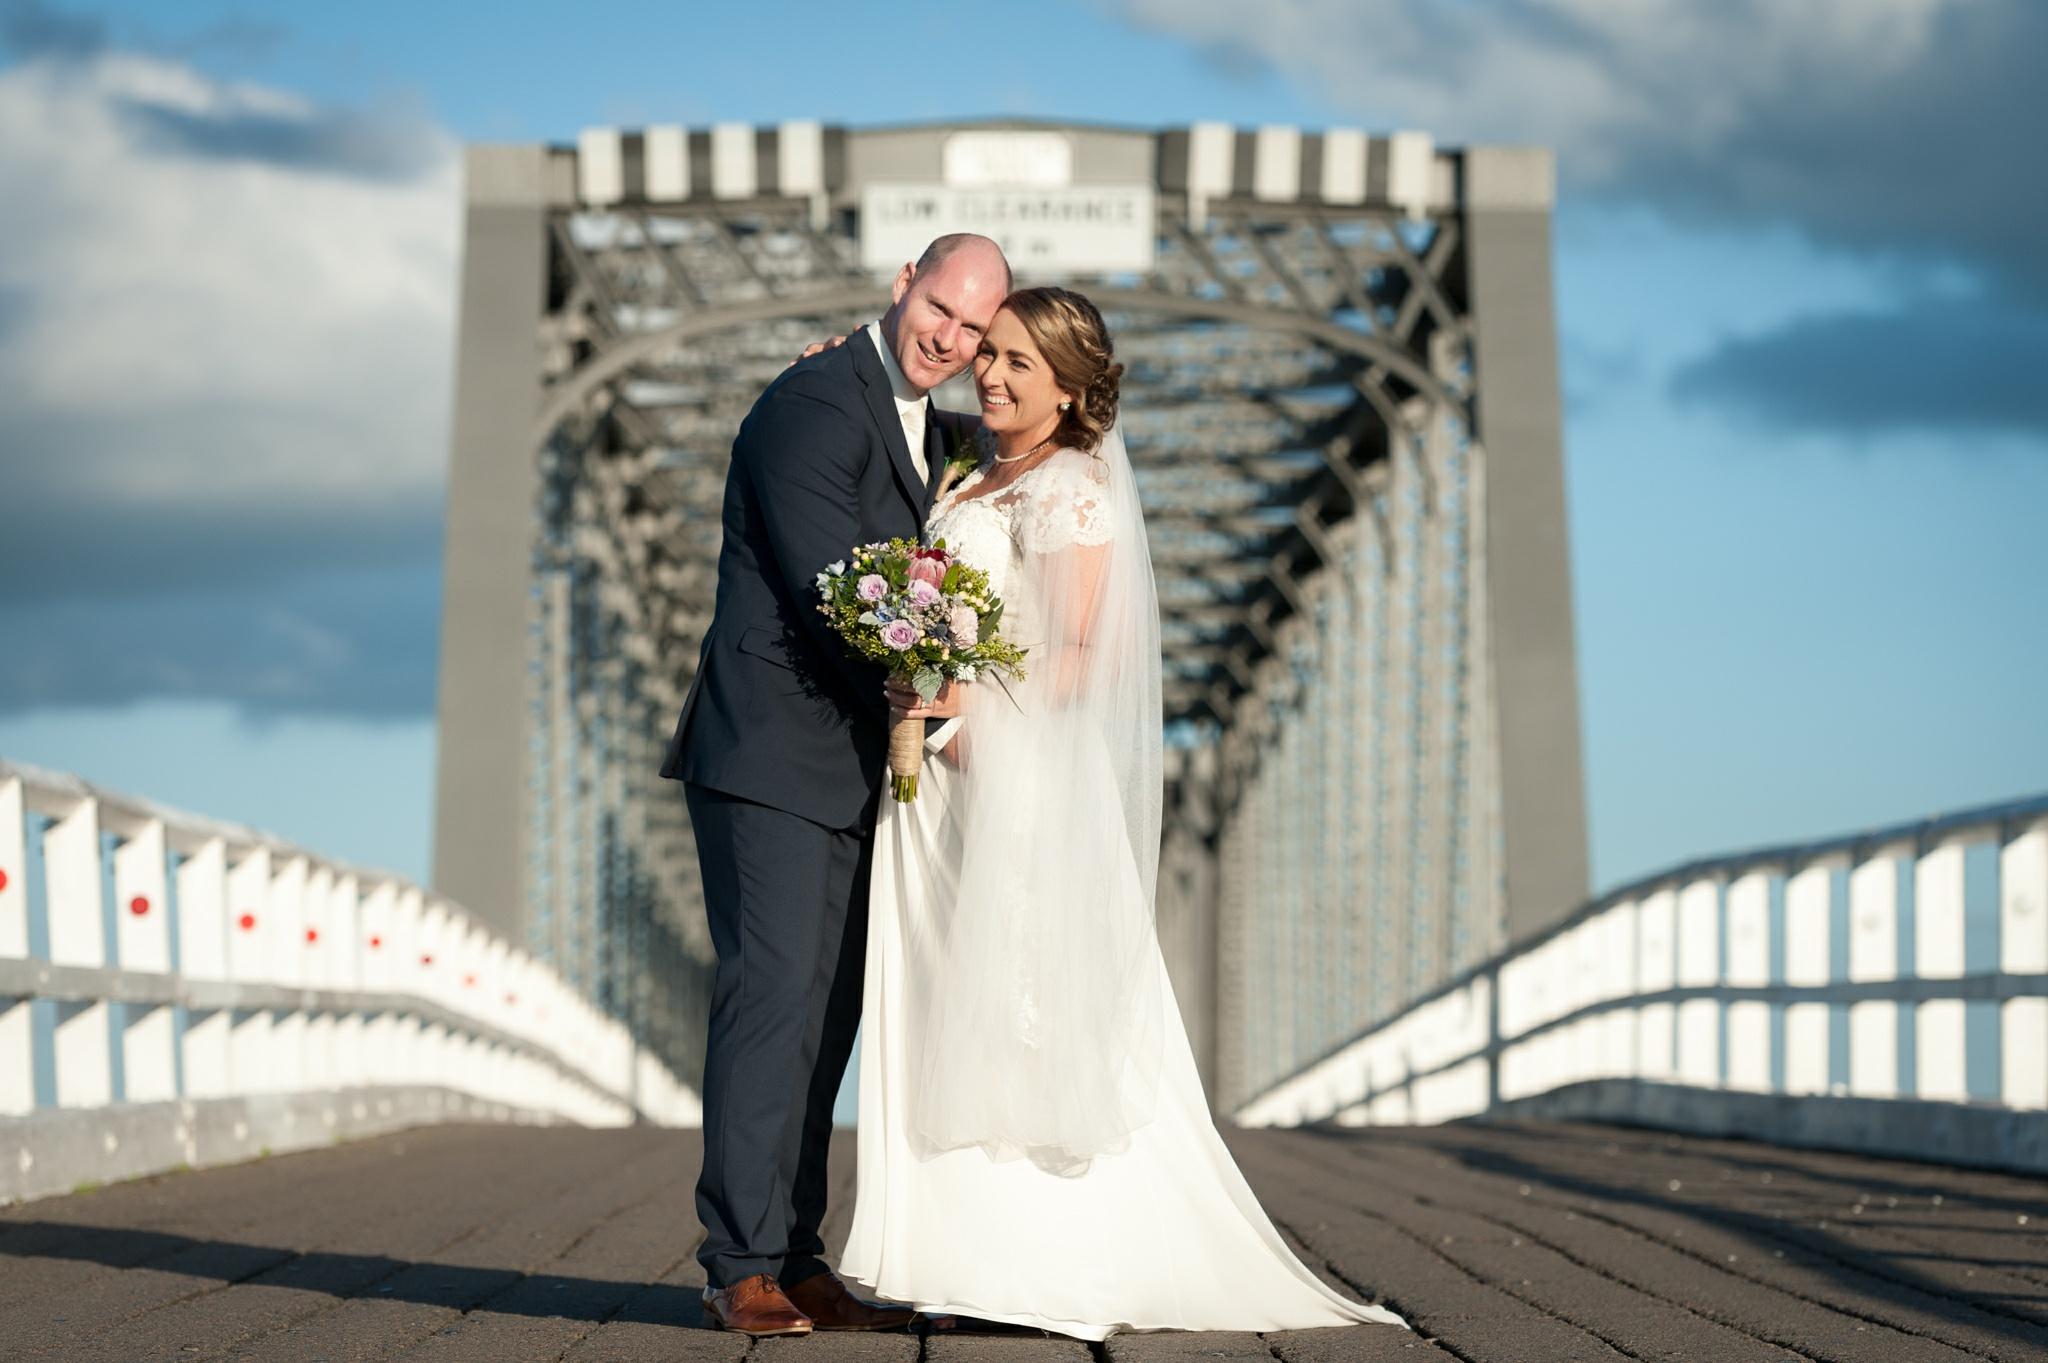 wedding_Andrew-&-Kim_0027.jpg